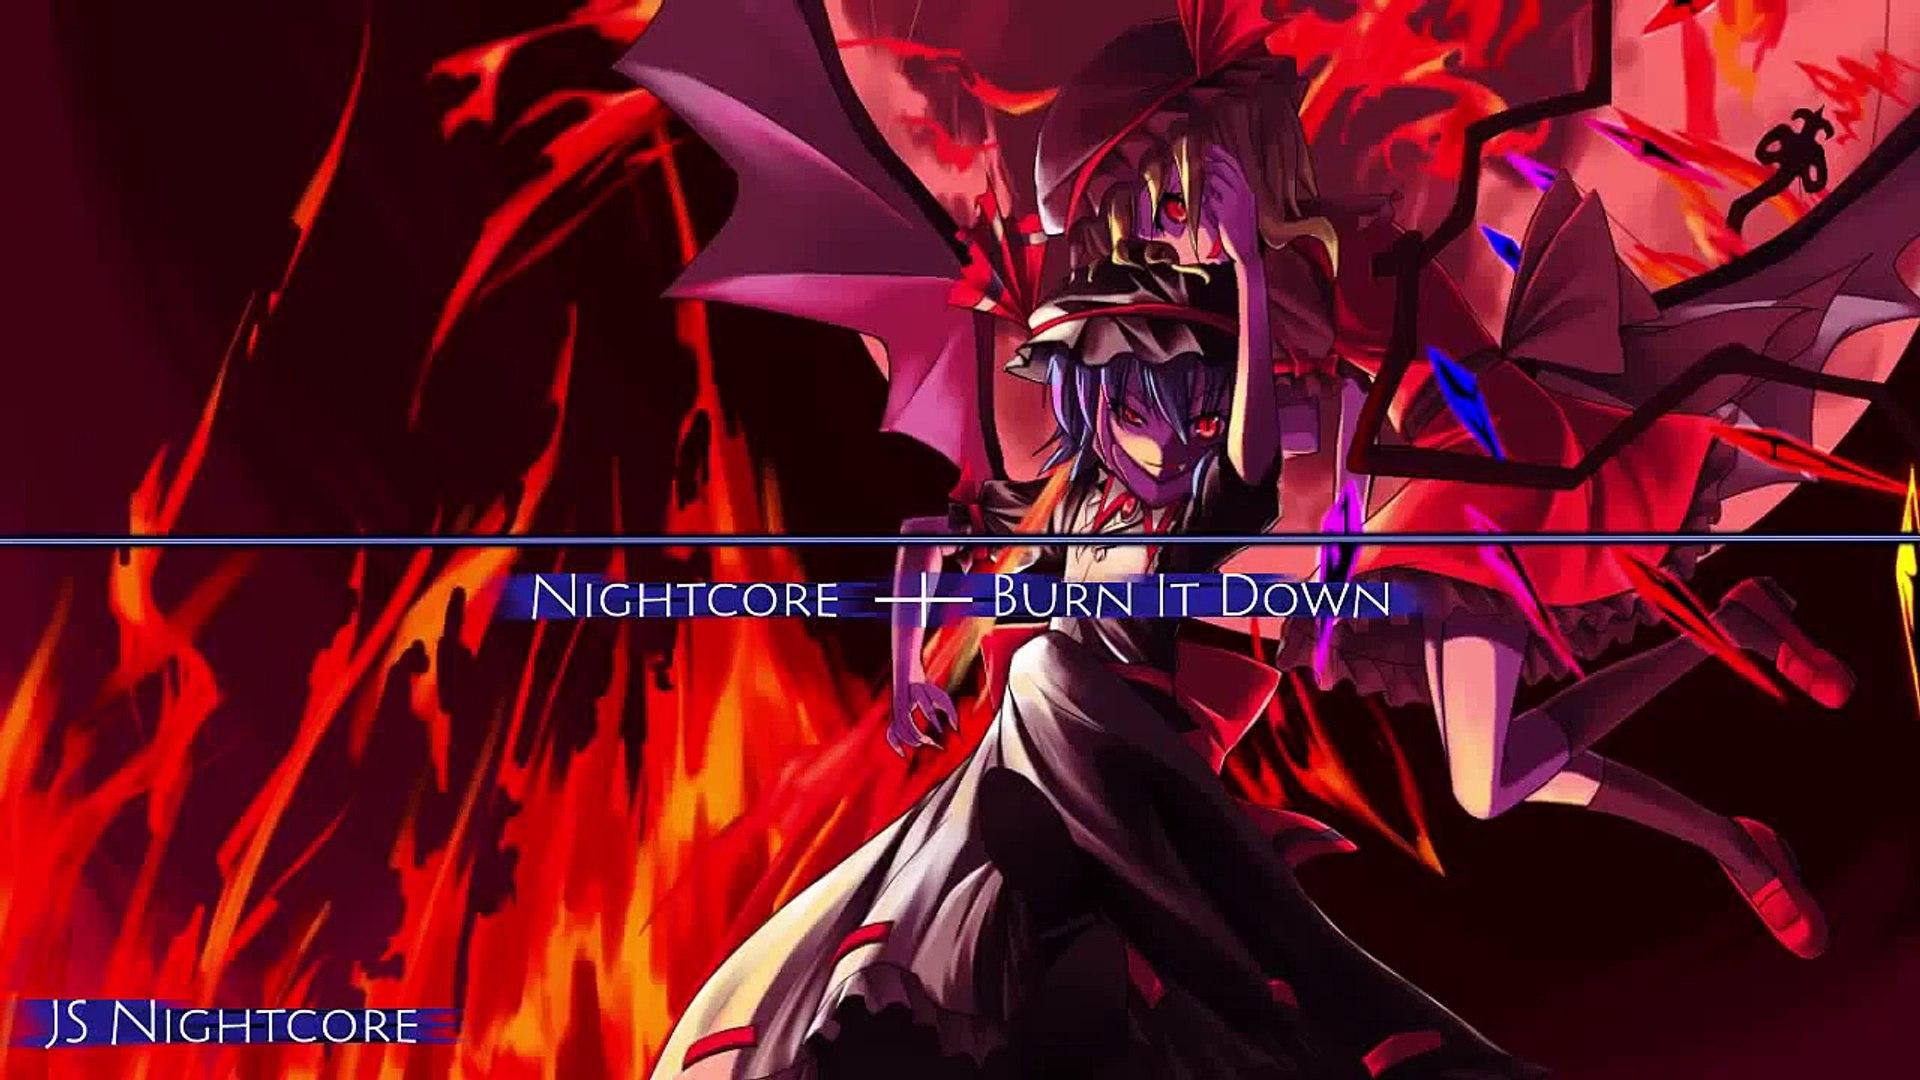 Nightcore ─┼─ Burn It Down, Music 2016, Remix Video,Epic, Music Gaming,Music Video Project